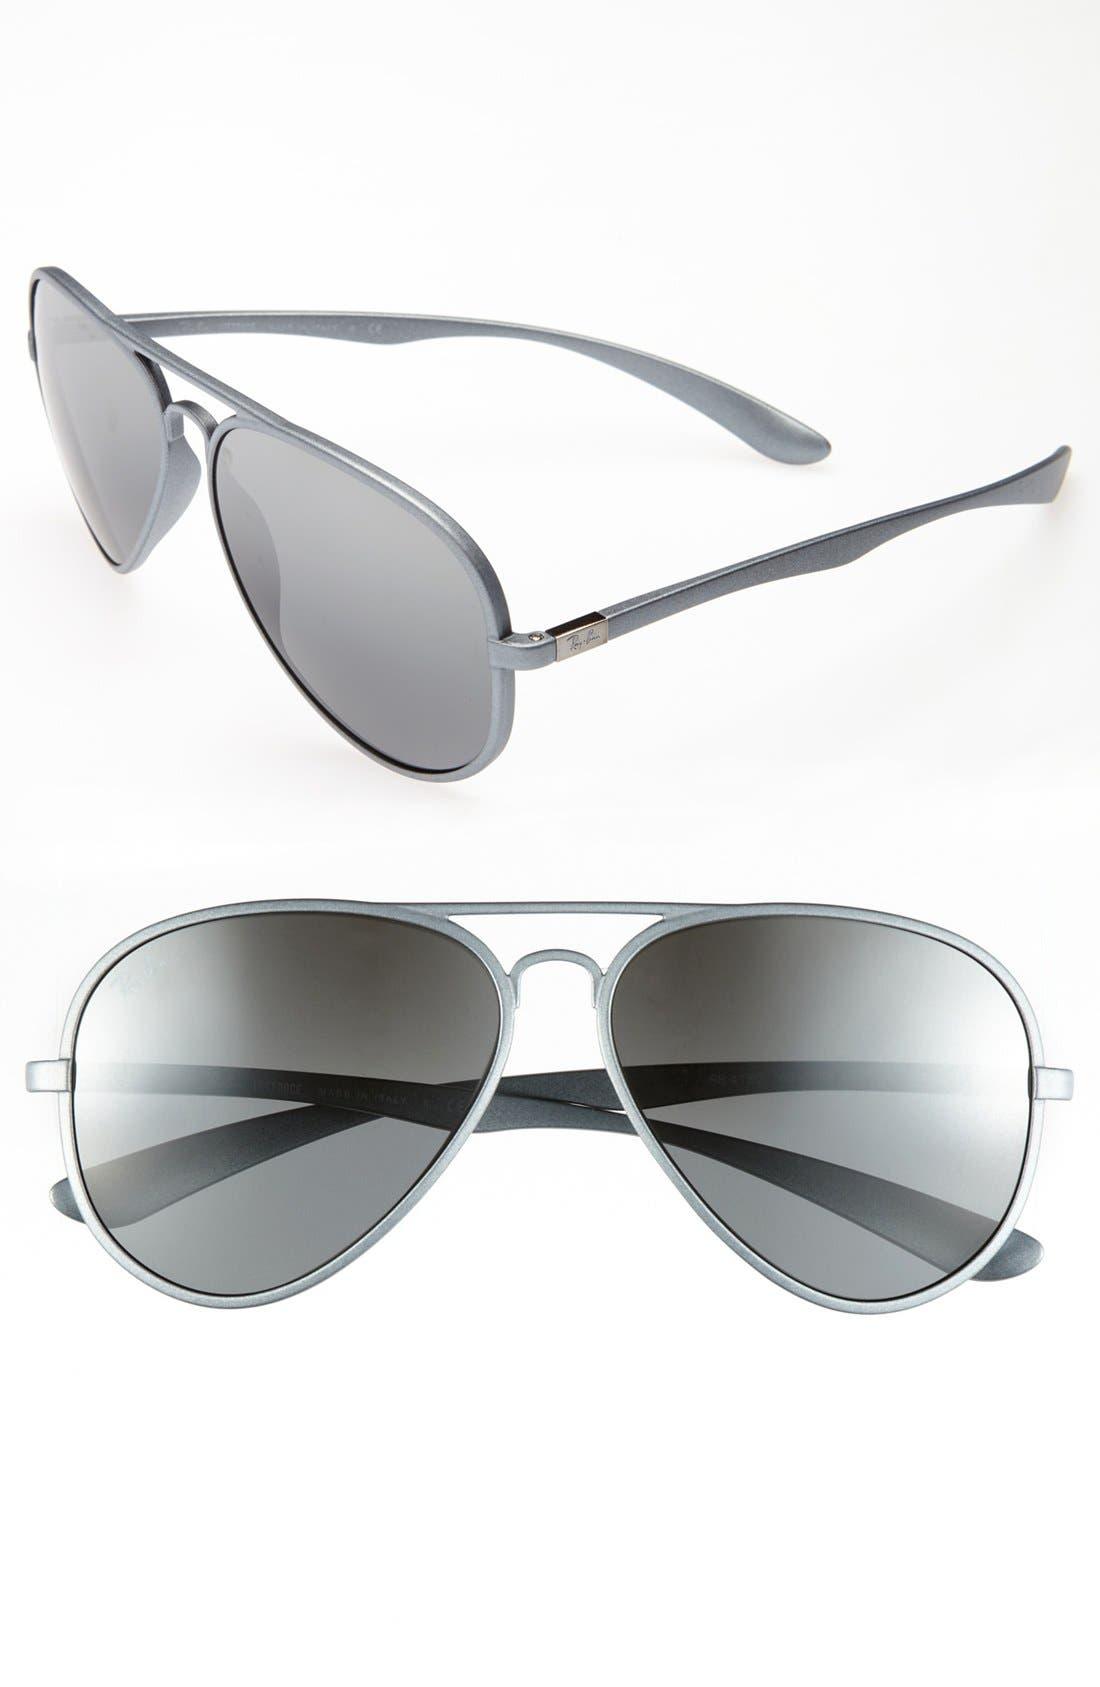 Main Image - Ray-Ban 58mm Aviator Sunglasses